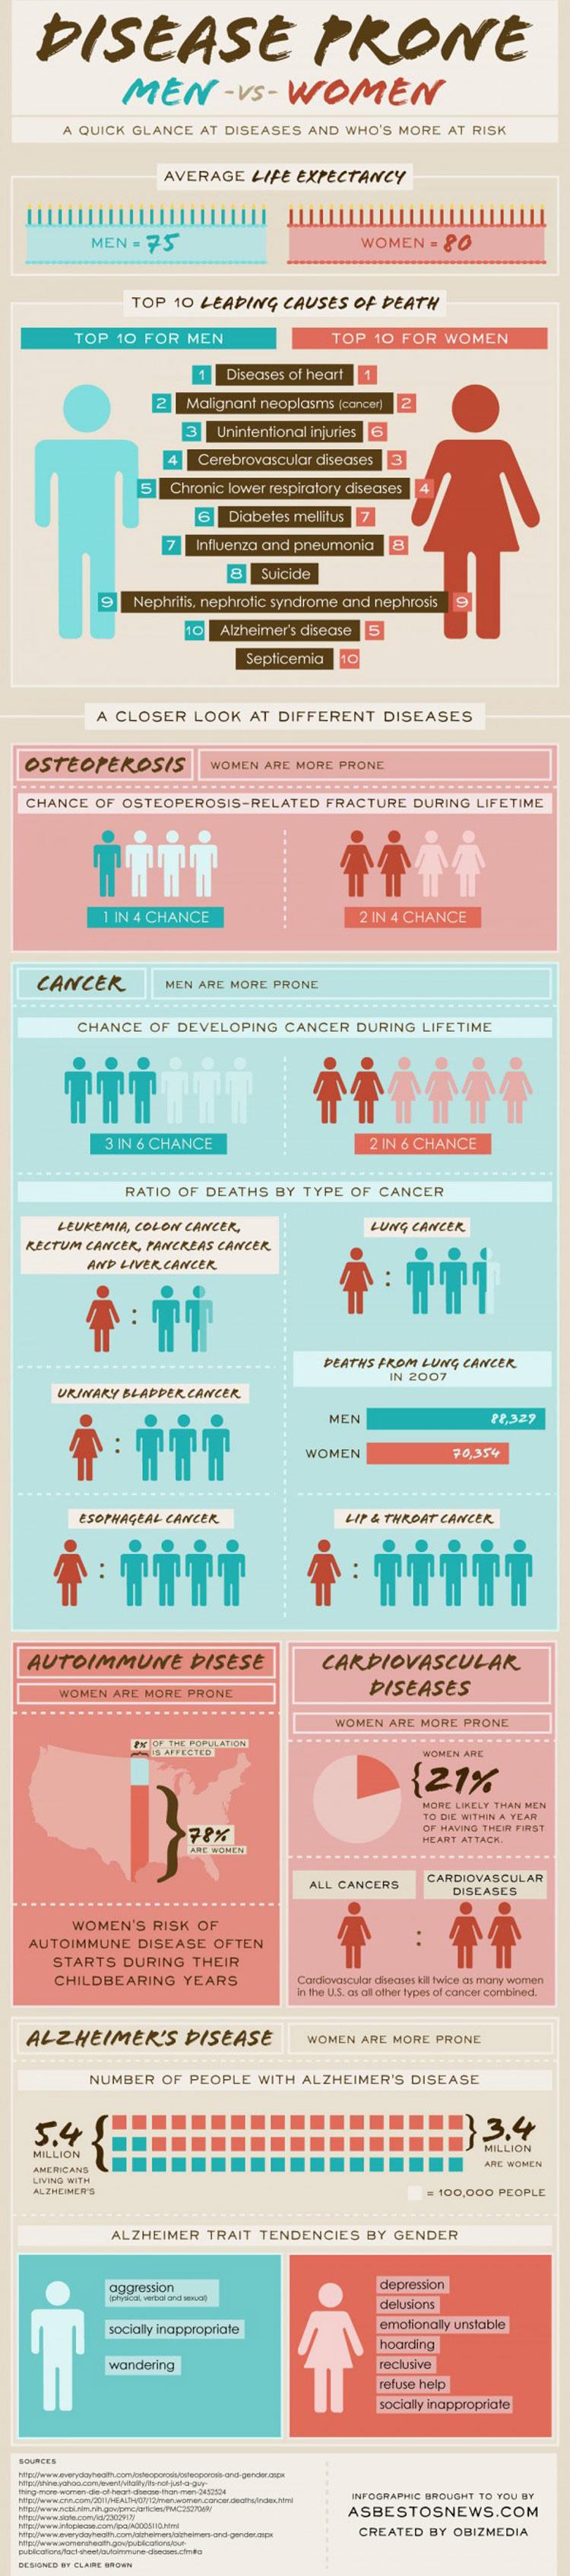 disease-prone-men-vs-women-infographic-750